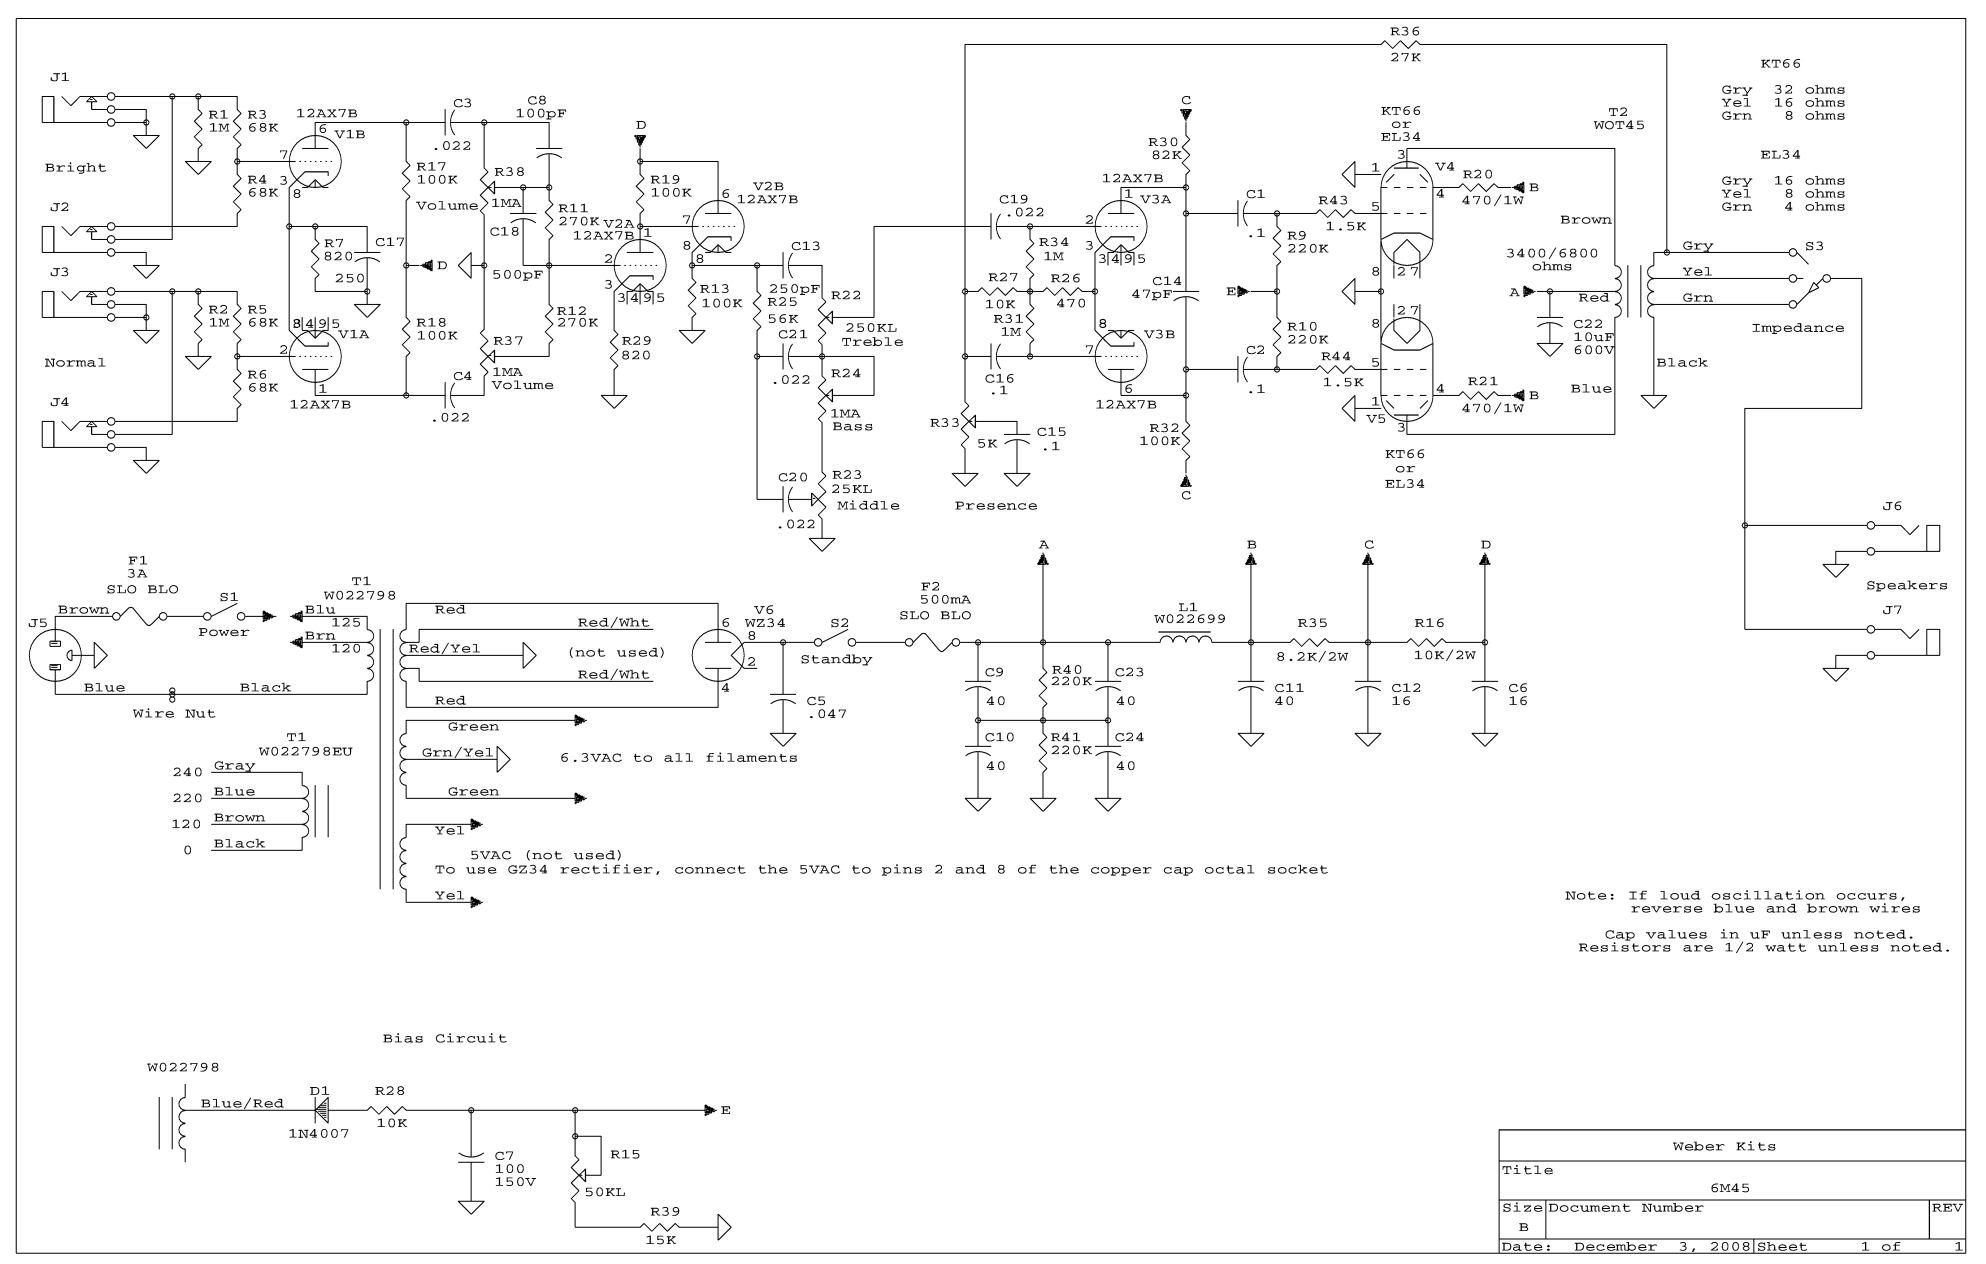 6m45 Amp Kit Vox Guitar Wiring Diagram Schematic